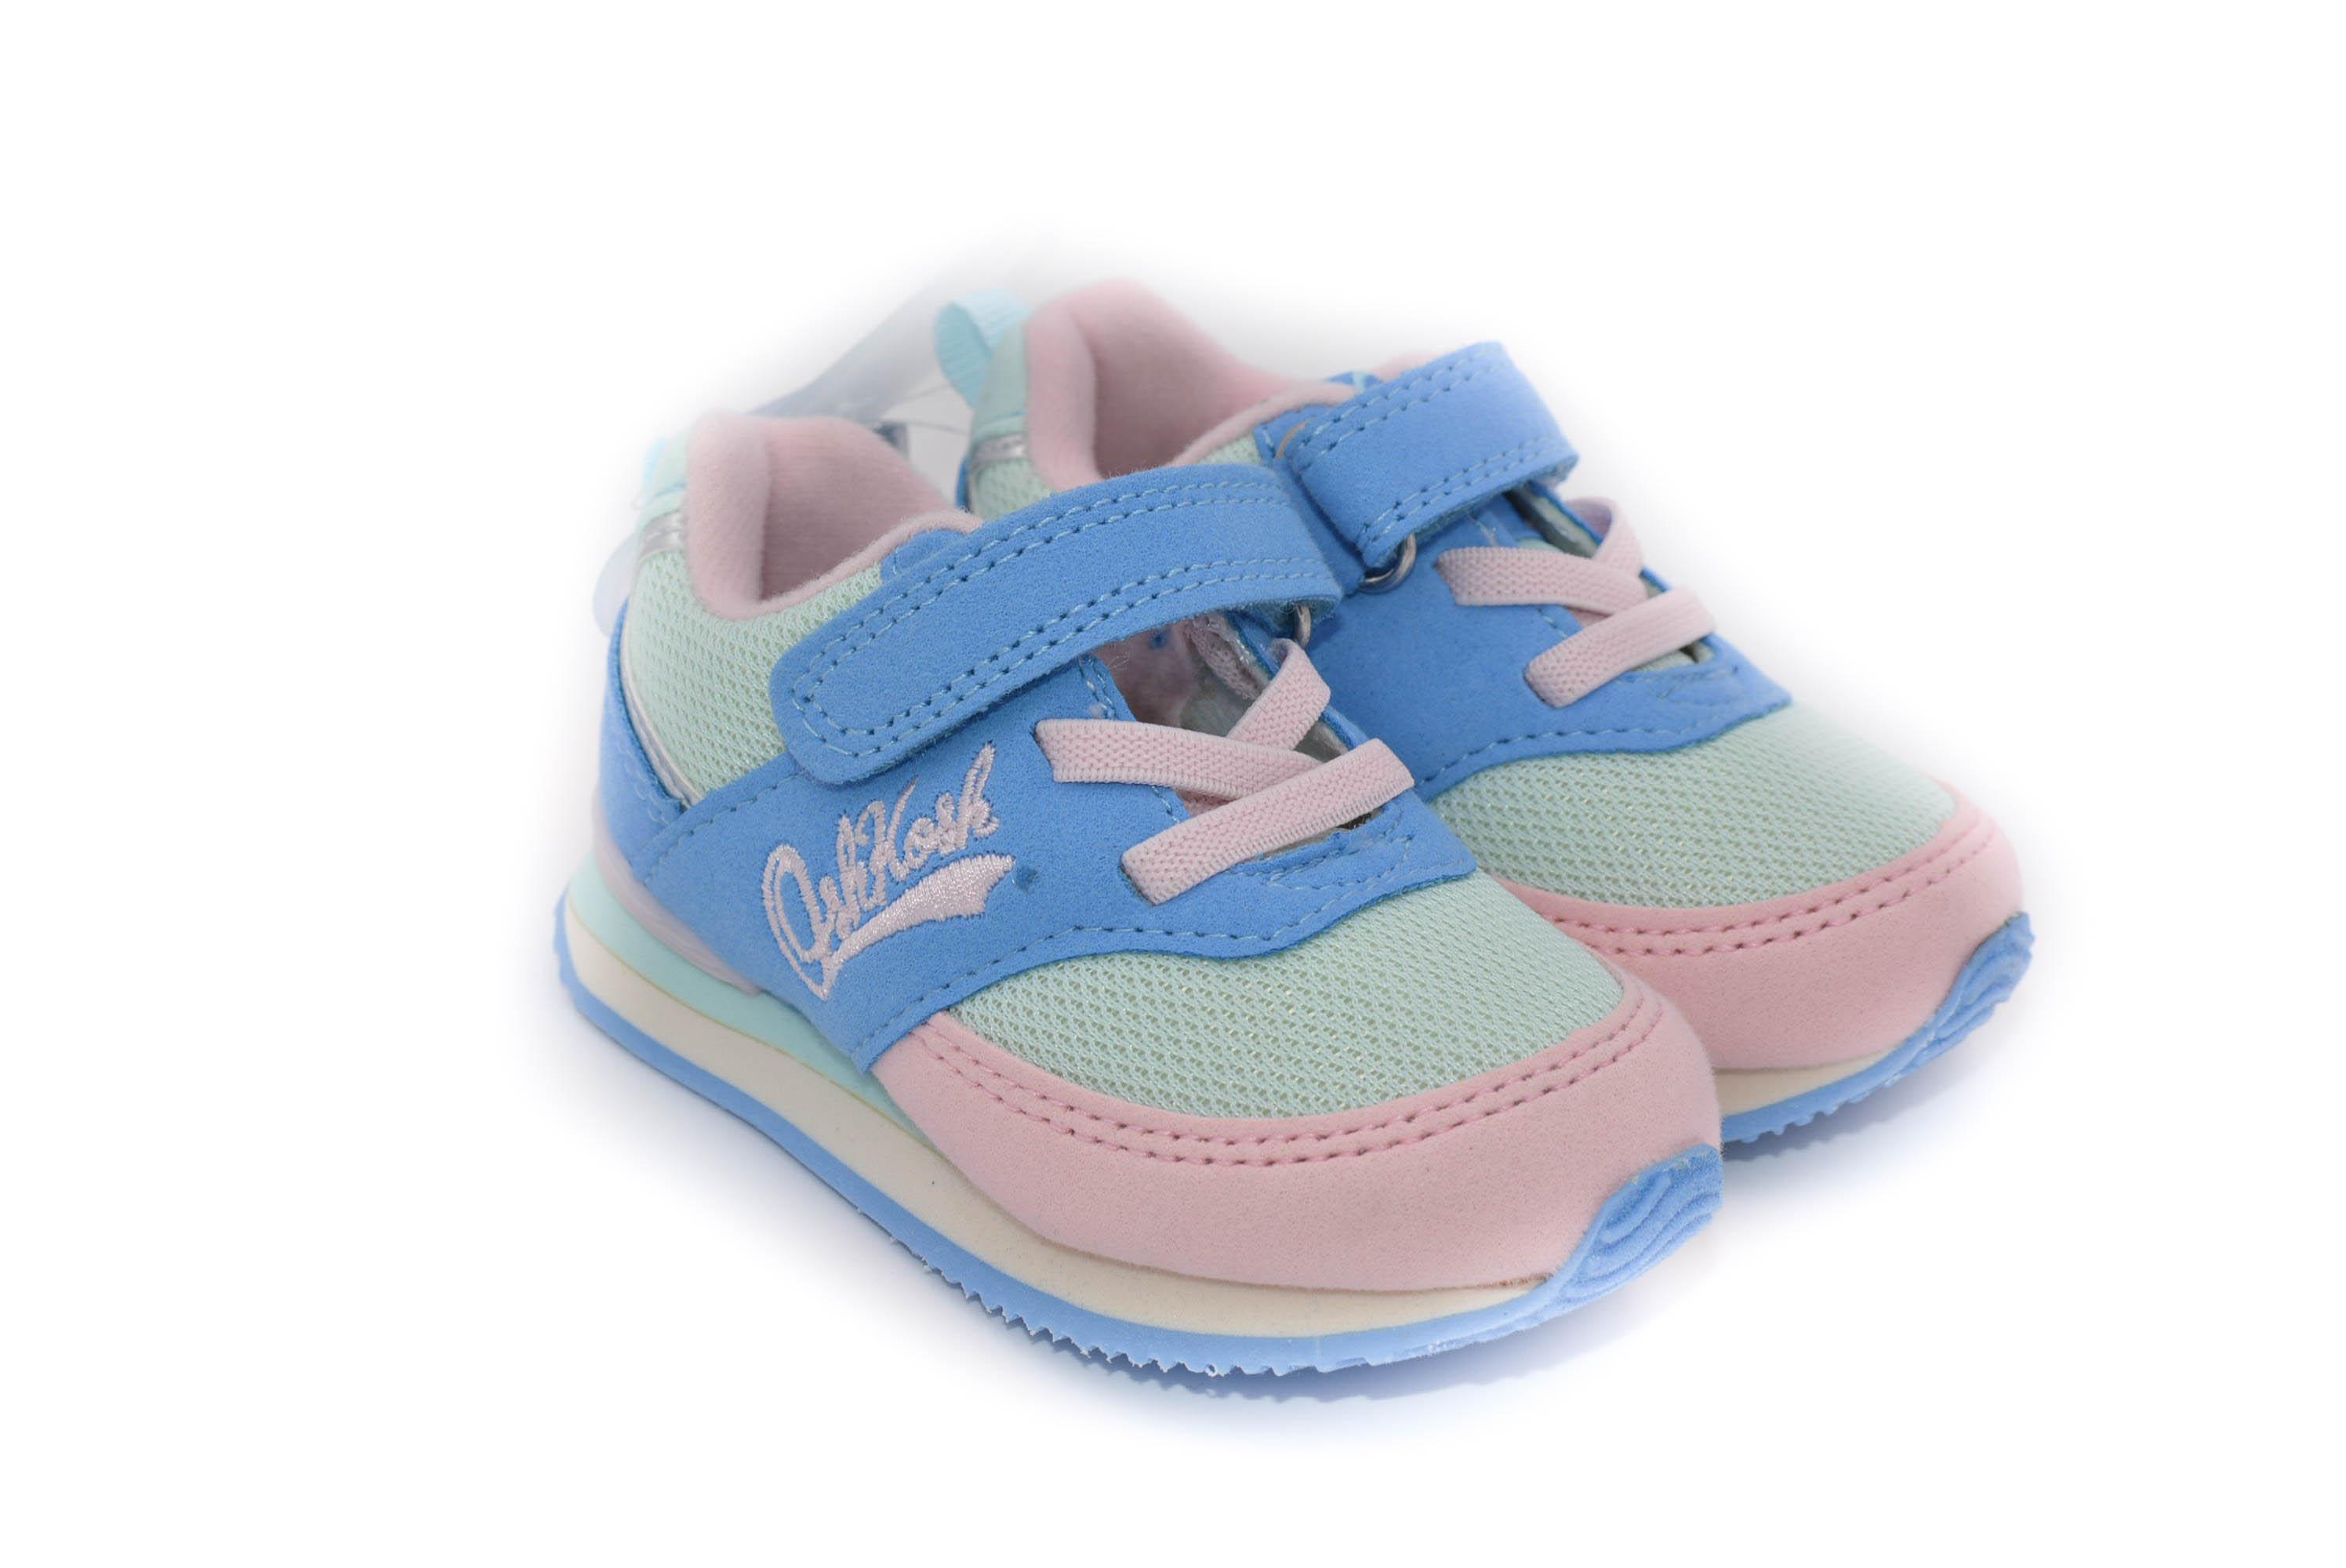 Oshkosh B/'Gosh Baby Girls Sneakers Shoes Size 5 7 Toddler Multi Color